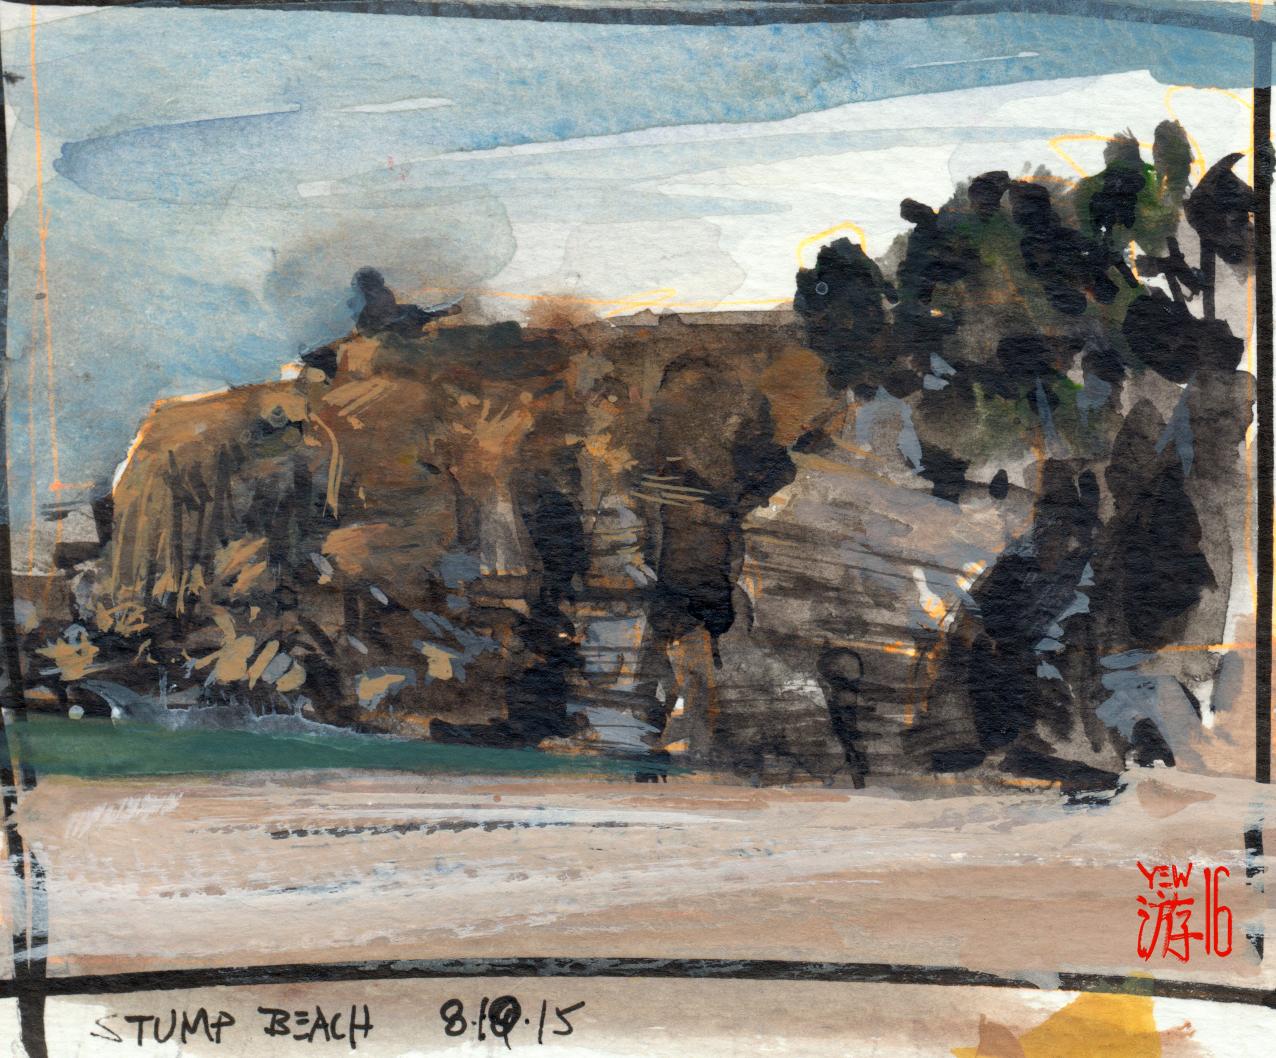 Stump Beach